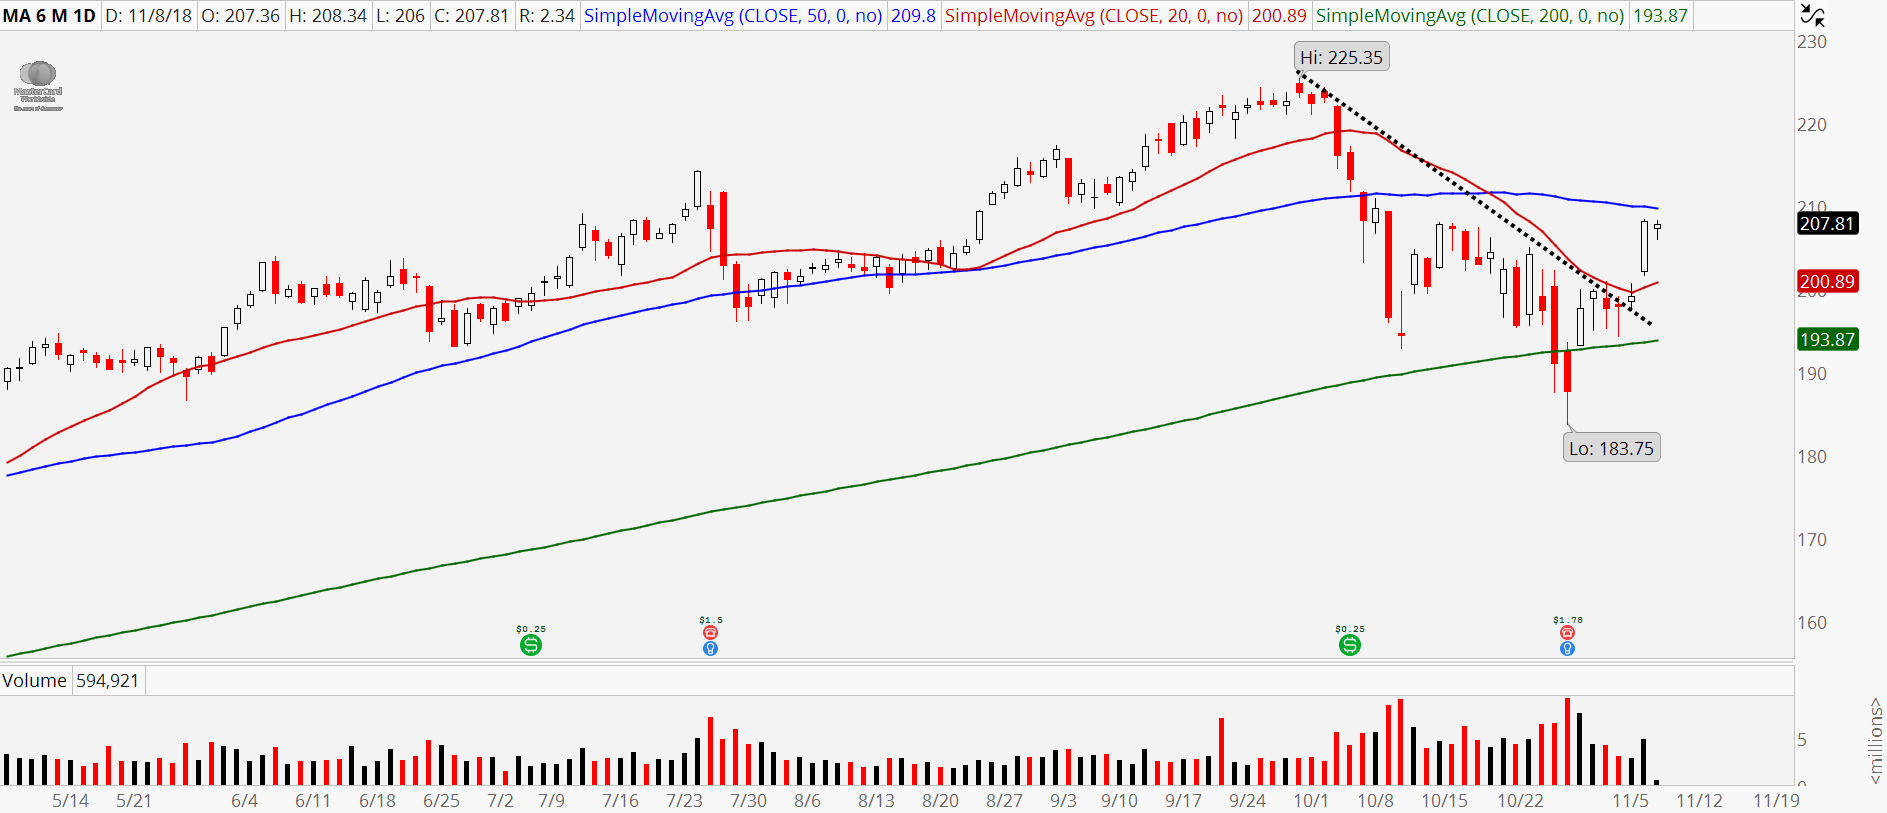 3 Relative Strength Stocks to Buy: Mastercard (MA)